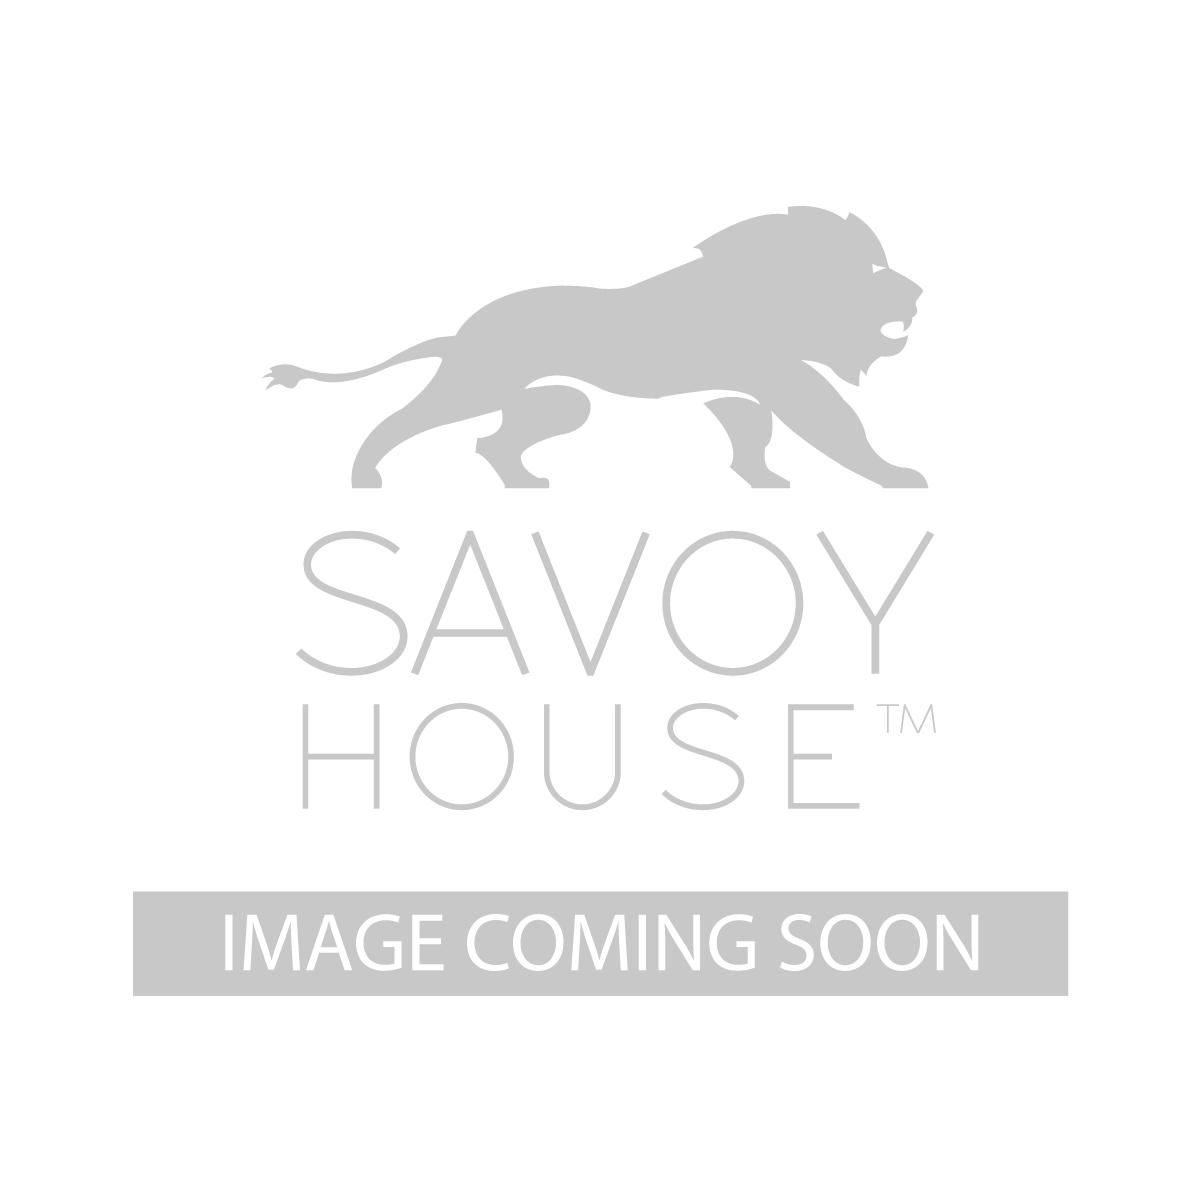 1 9067 3 100 3 light mini chandelier by savoy house 3 light mini chandelier aloadofball Choice Image